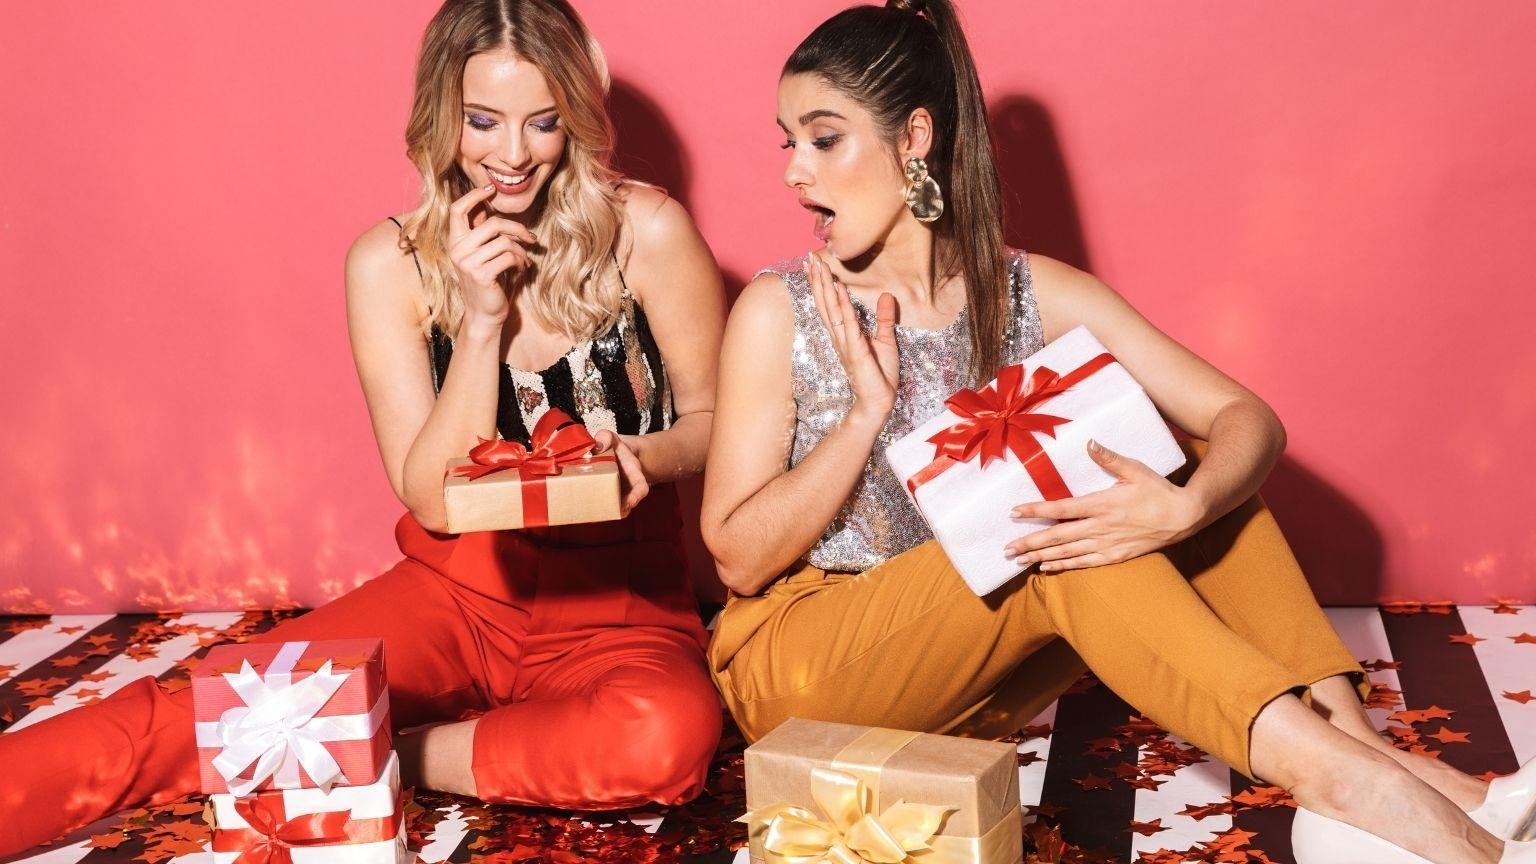 Girls unwrapping fashion presents